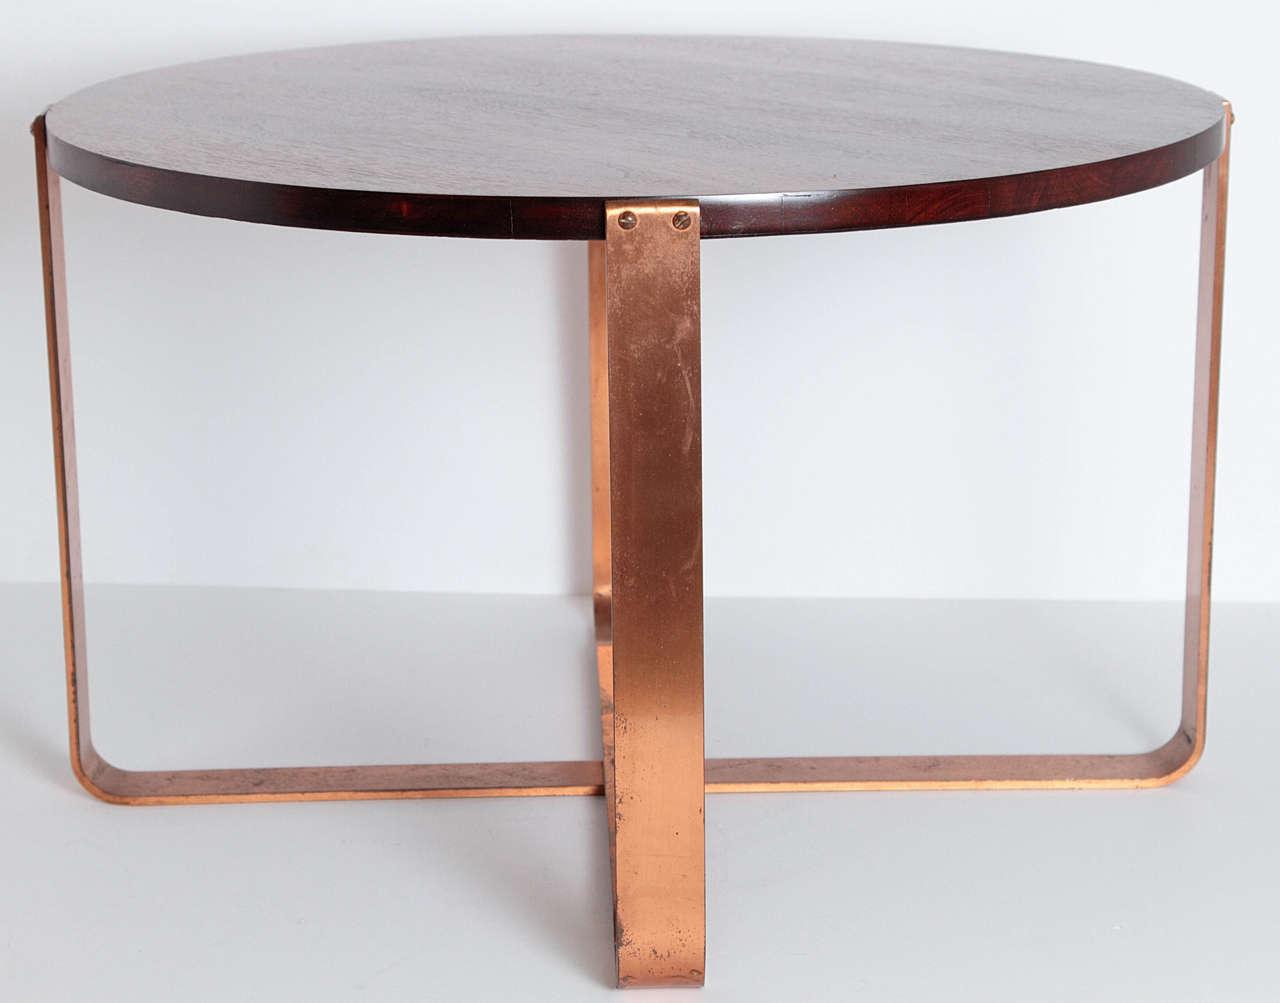 American Art Deco Coffee Table In Good Condition For Sale In Dallas, TX